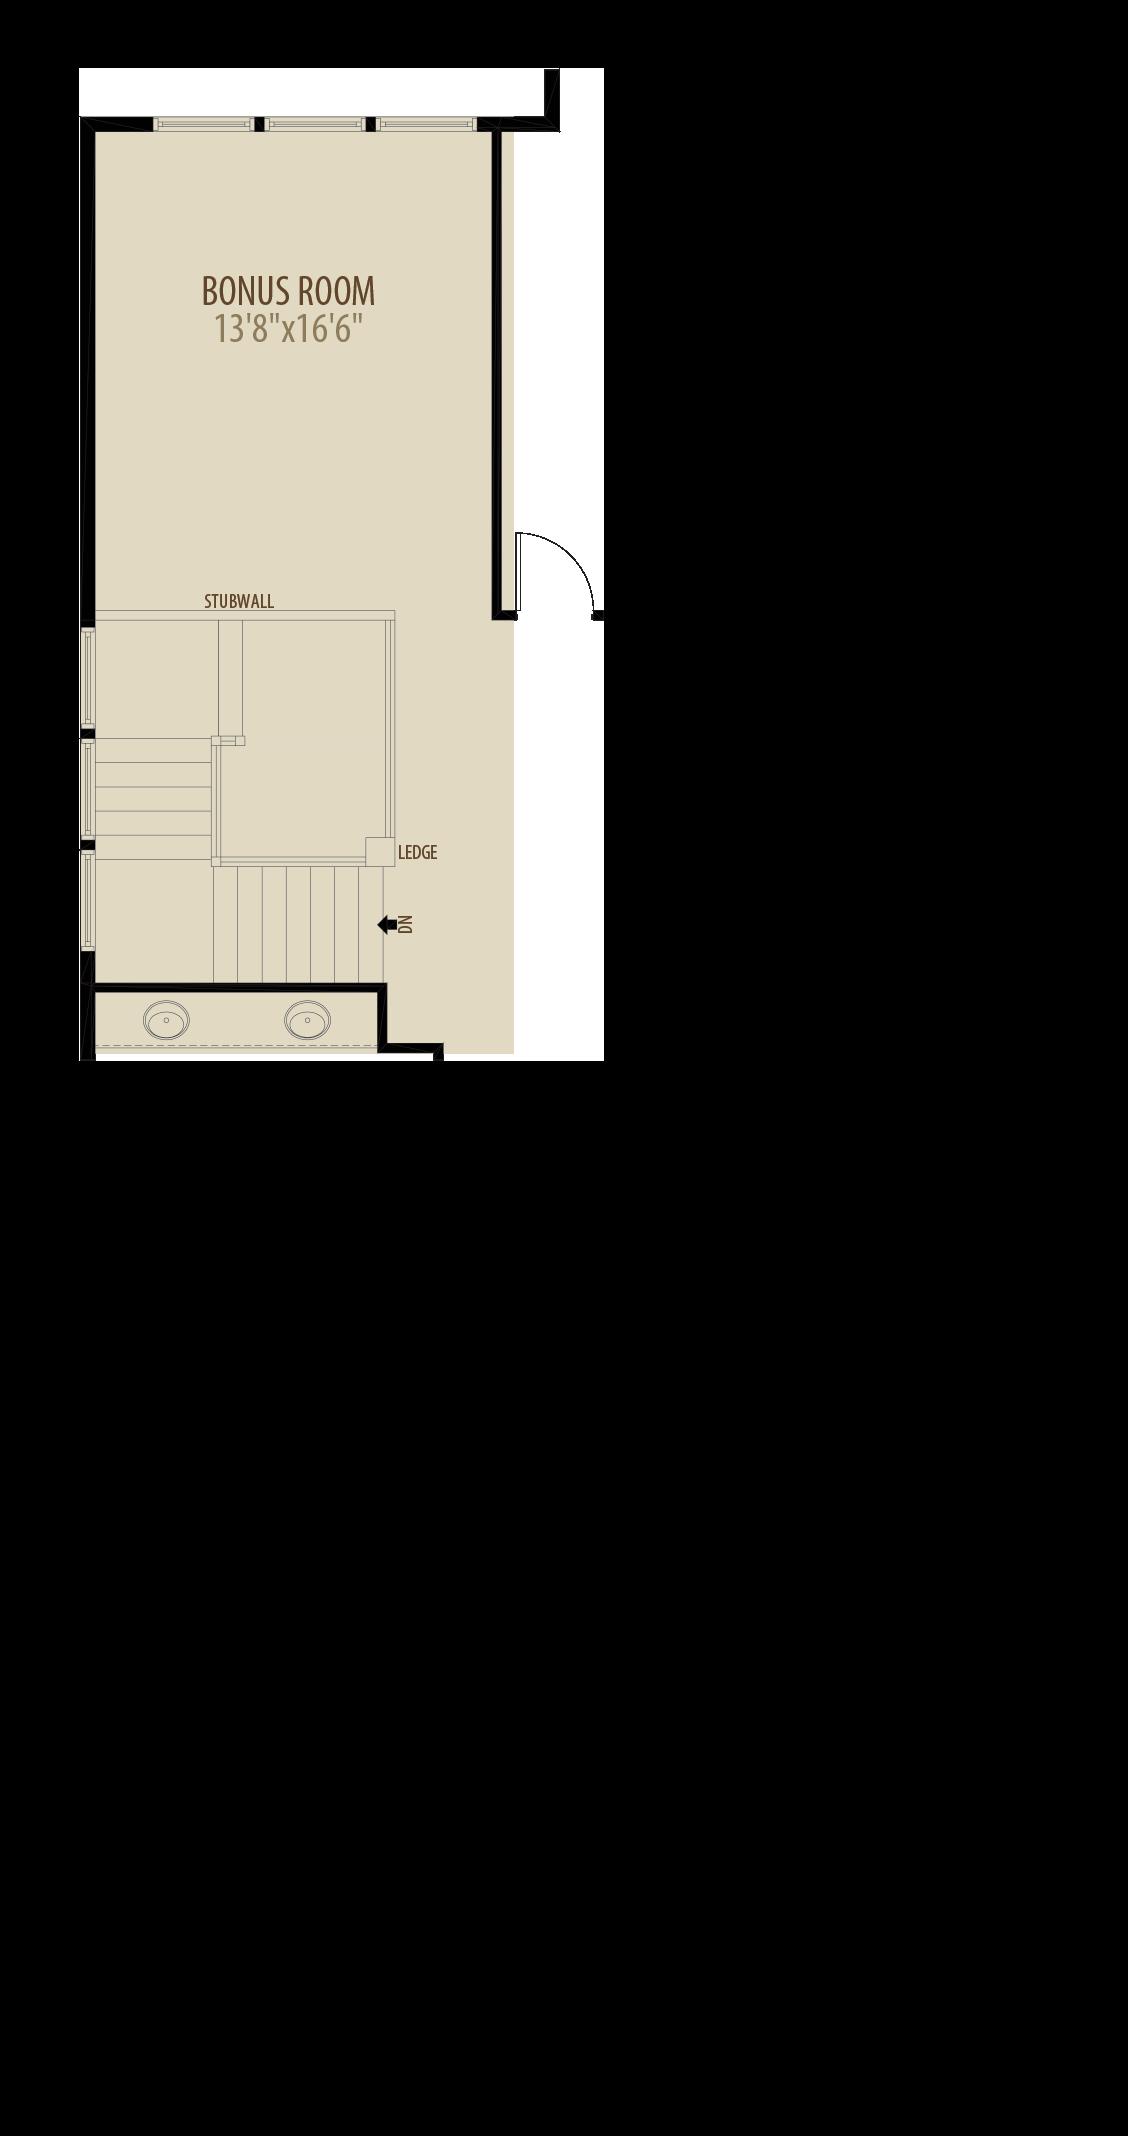 Bonus Room Adds 268 sq ft